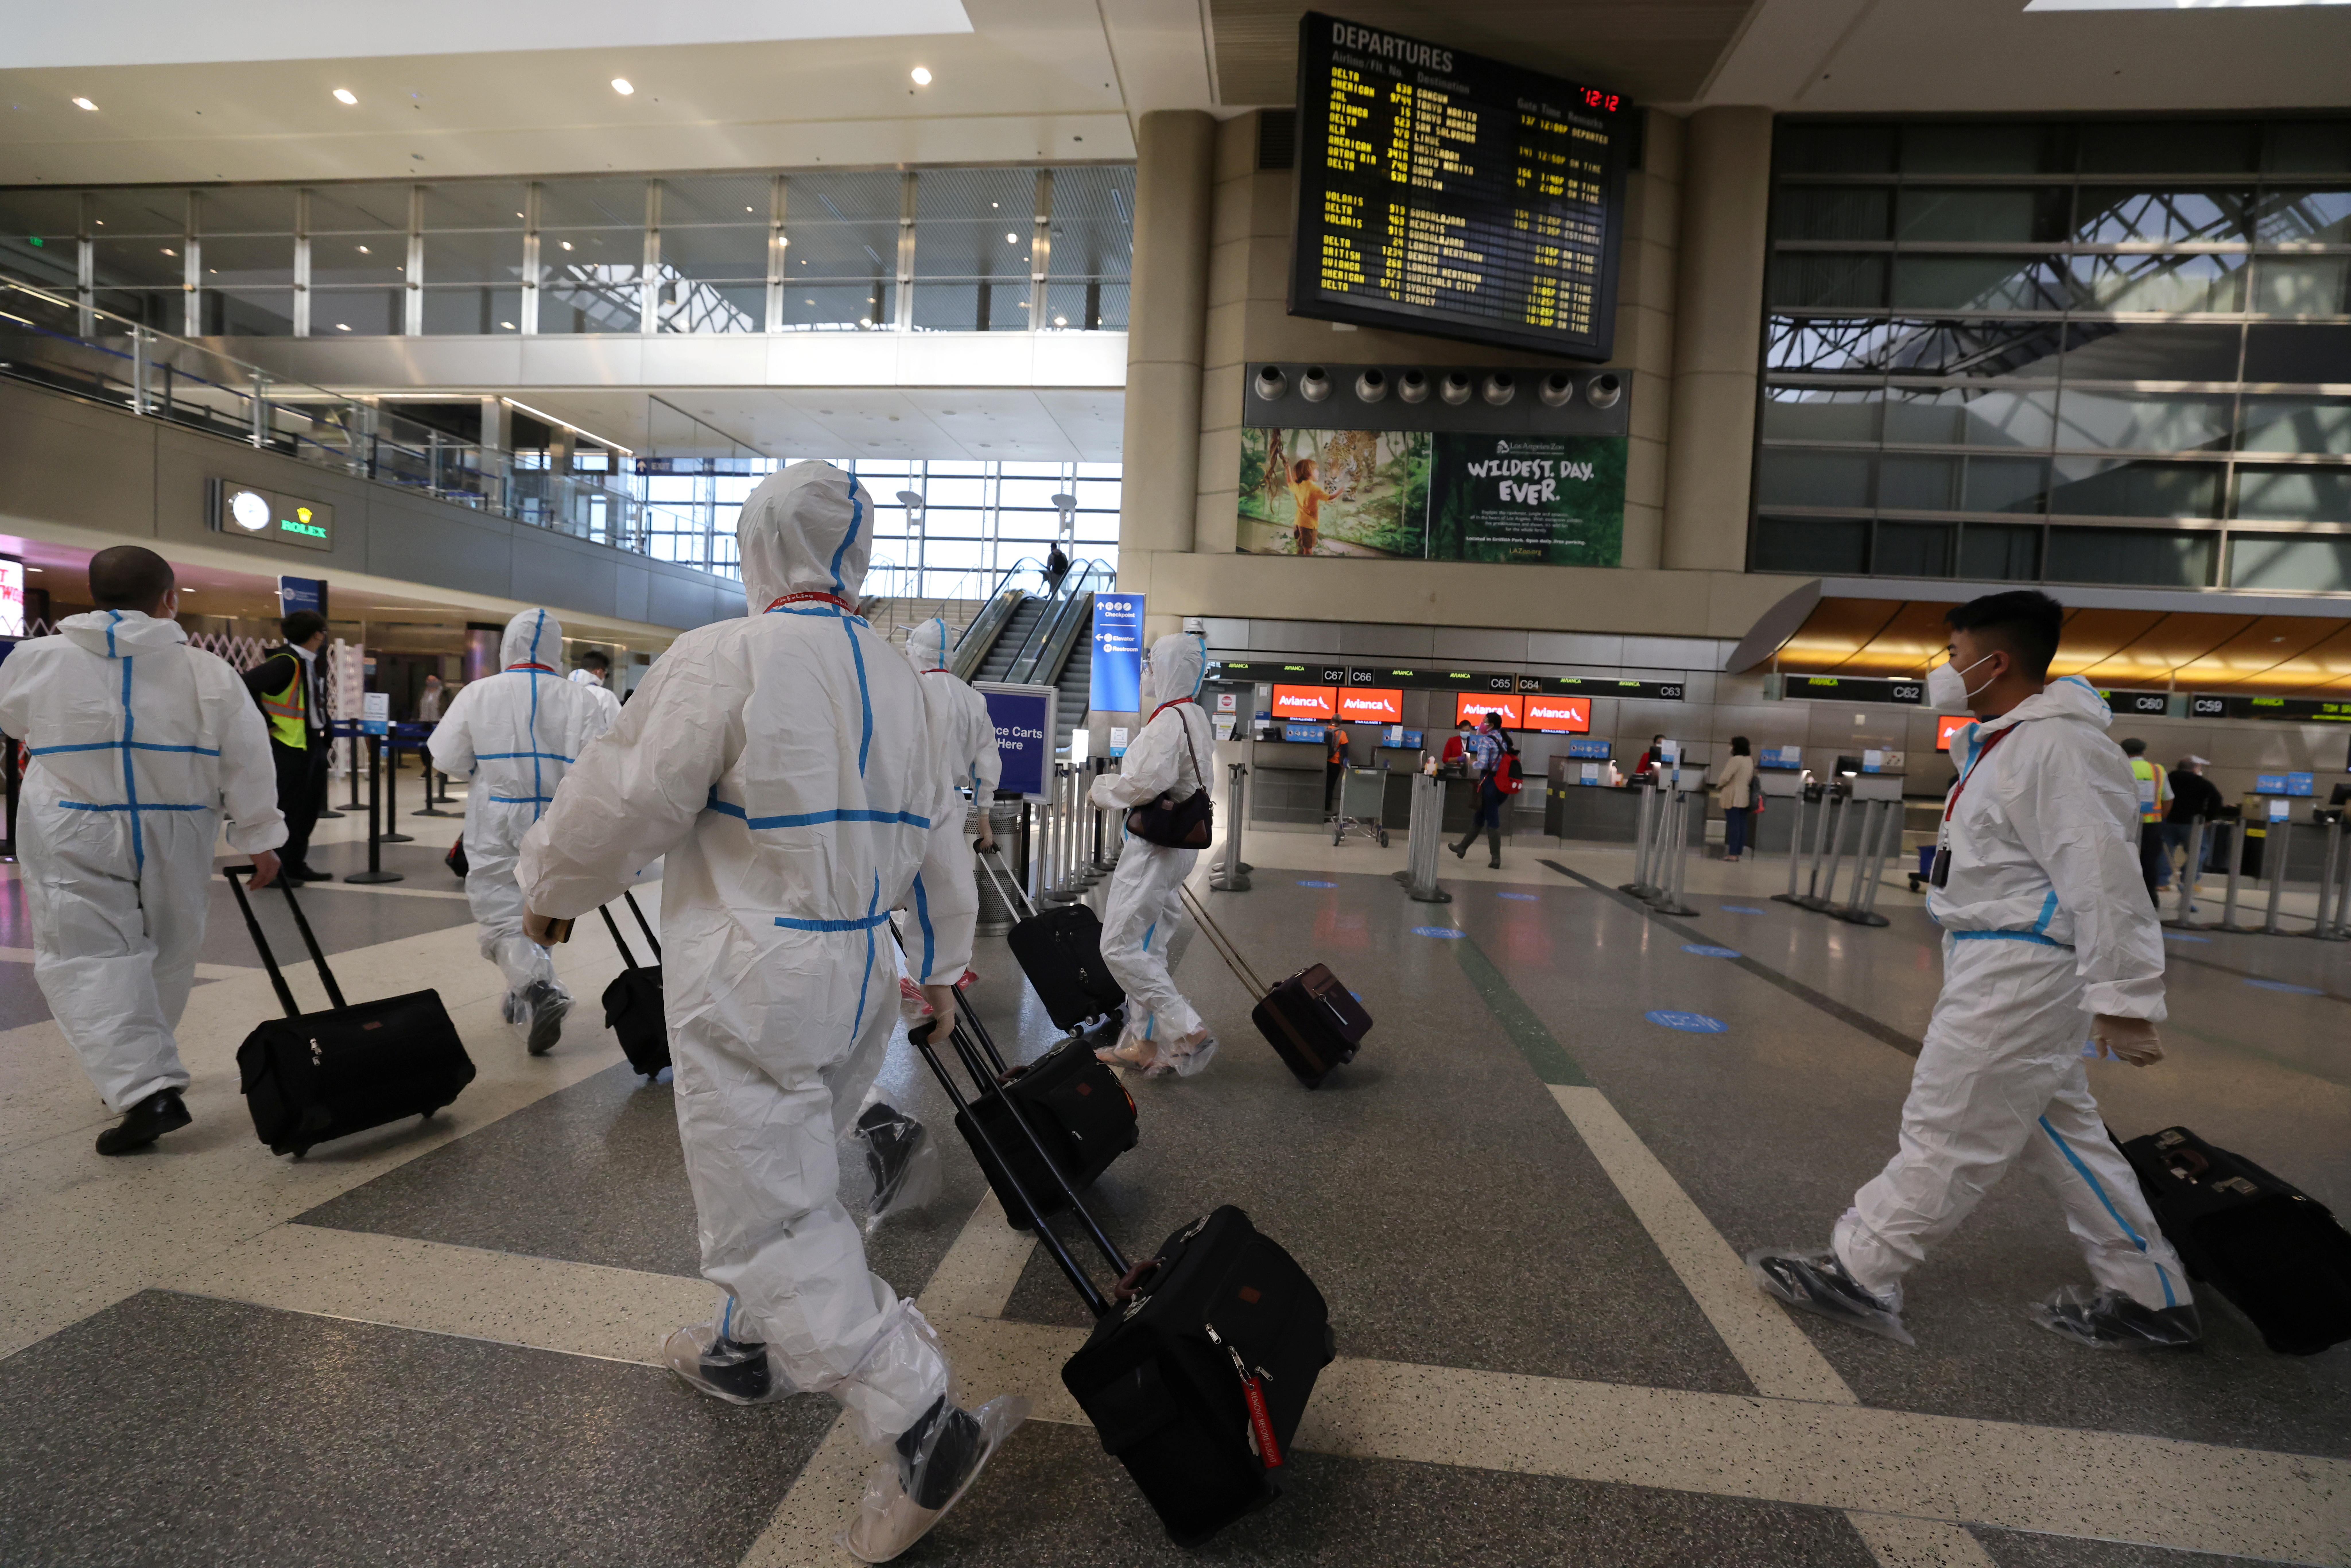 A flight crew walks through Tom Bradley international terminal at LAX airport, as the global outbreak of the coronavirus disease (COVID-19) continues, in Los Angeles, California, U.S., November 23, 2020. REUTERS/Lucy Nicholson - RC2B9K9555U7